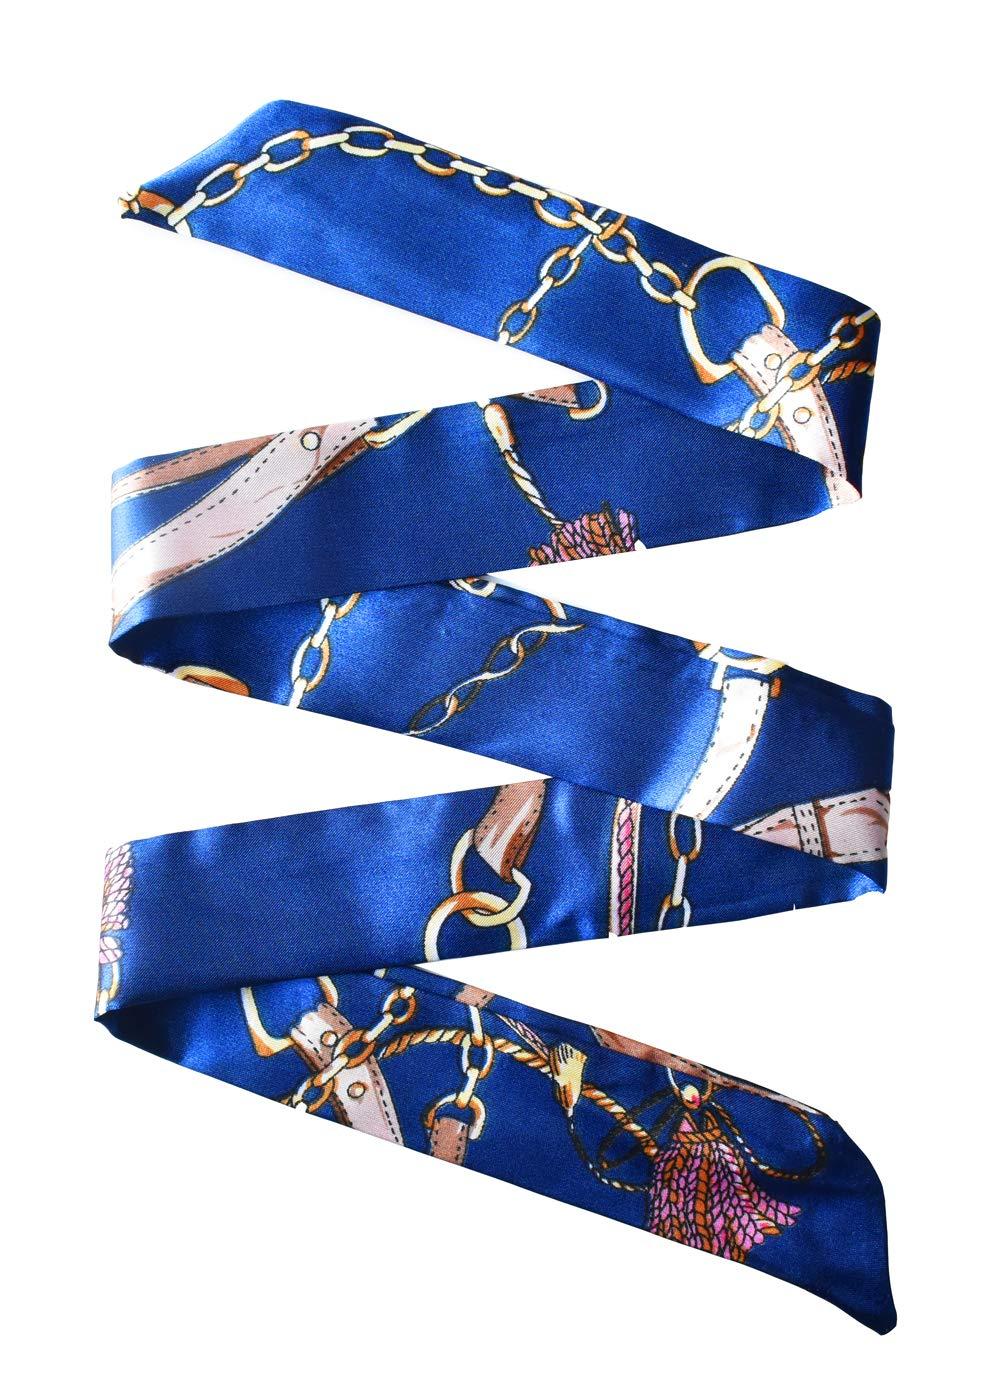 Women's Tote Bamboo Bag from Covelin, Handmade Top Handle Handbag for Summer Sea by Covelin (Image #5)